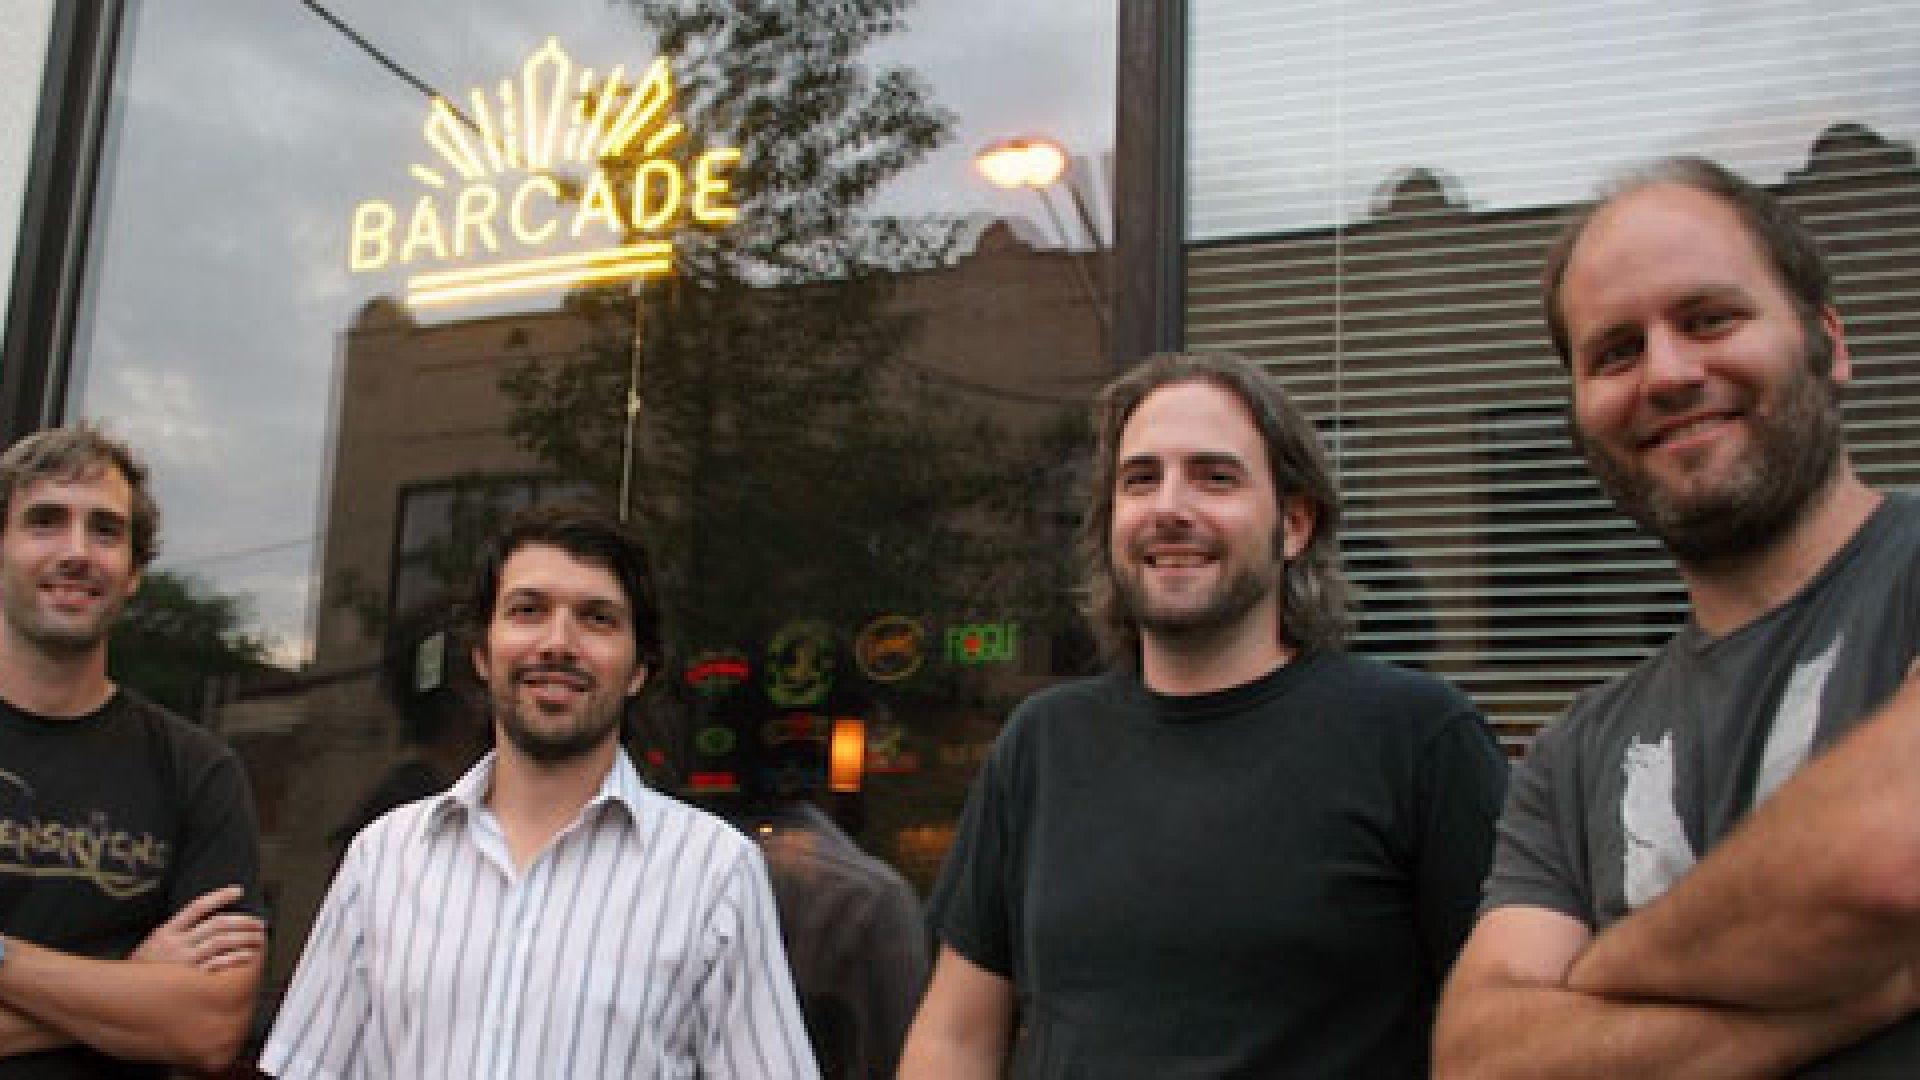 From left, partners Scott Beard, Paul Kermizian, Kevin Beard, and Pete Langway outside of Barcade in Jersey City.